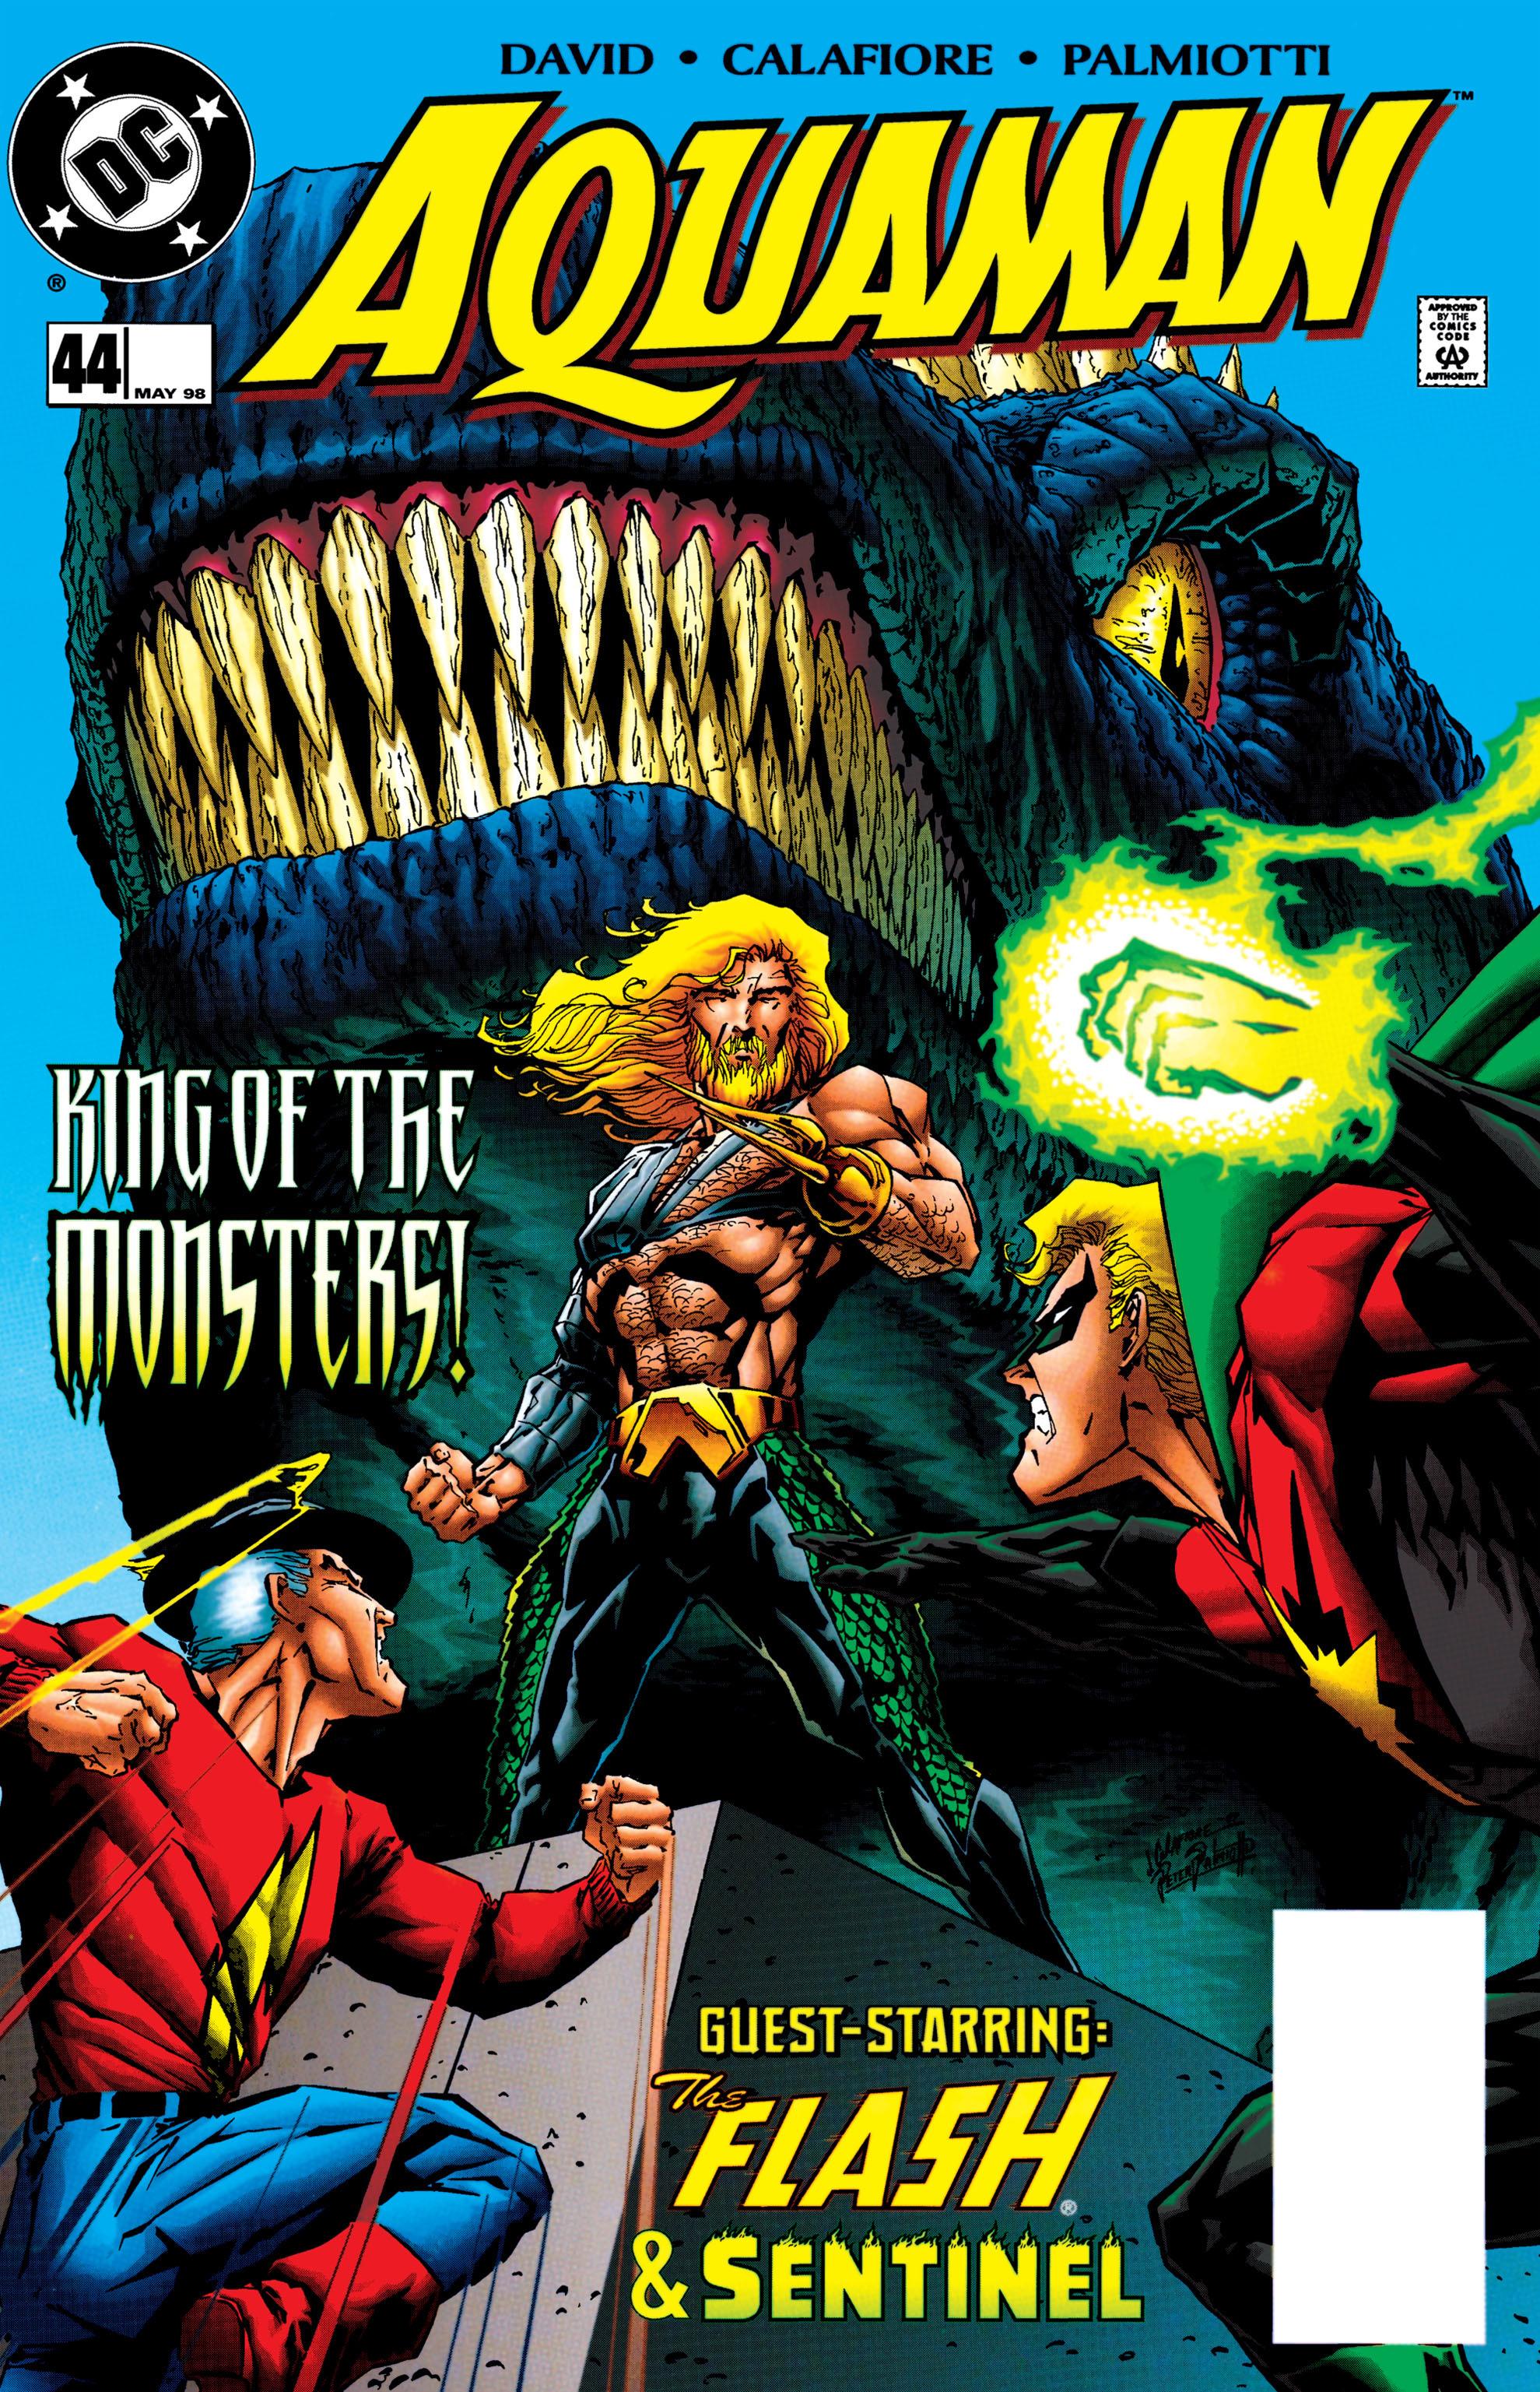 Read online Aquaman (1994) comic -  Issue #44 - 1